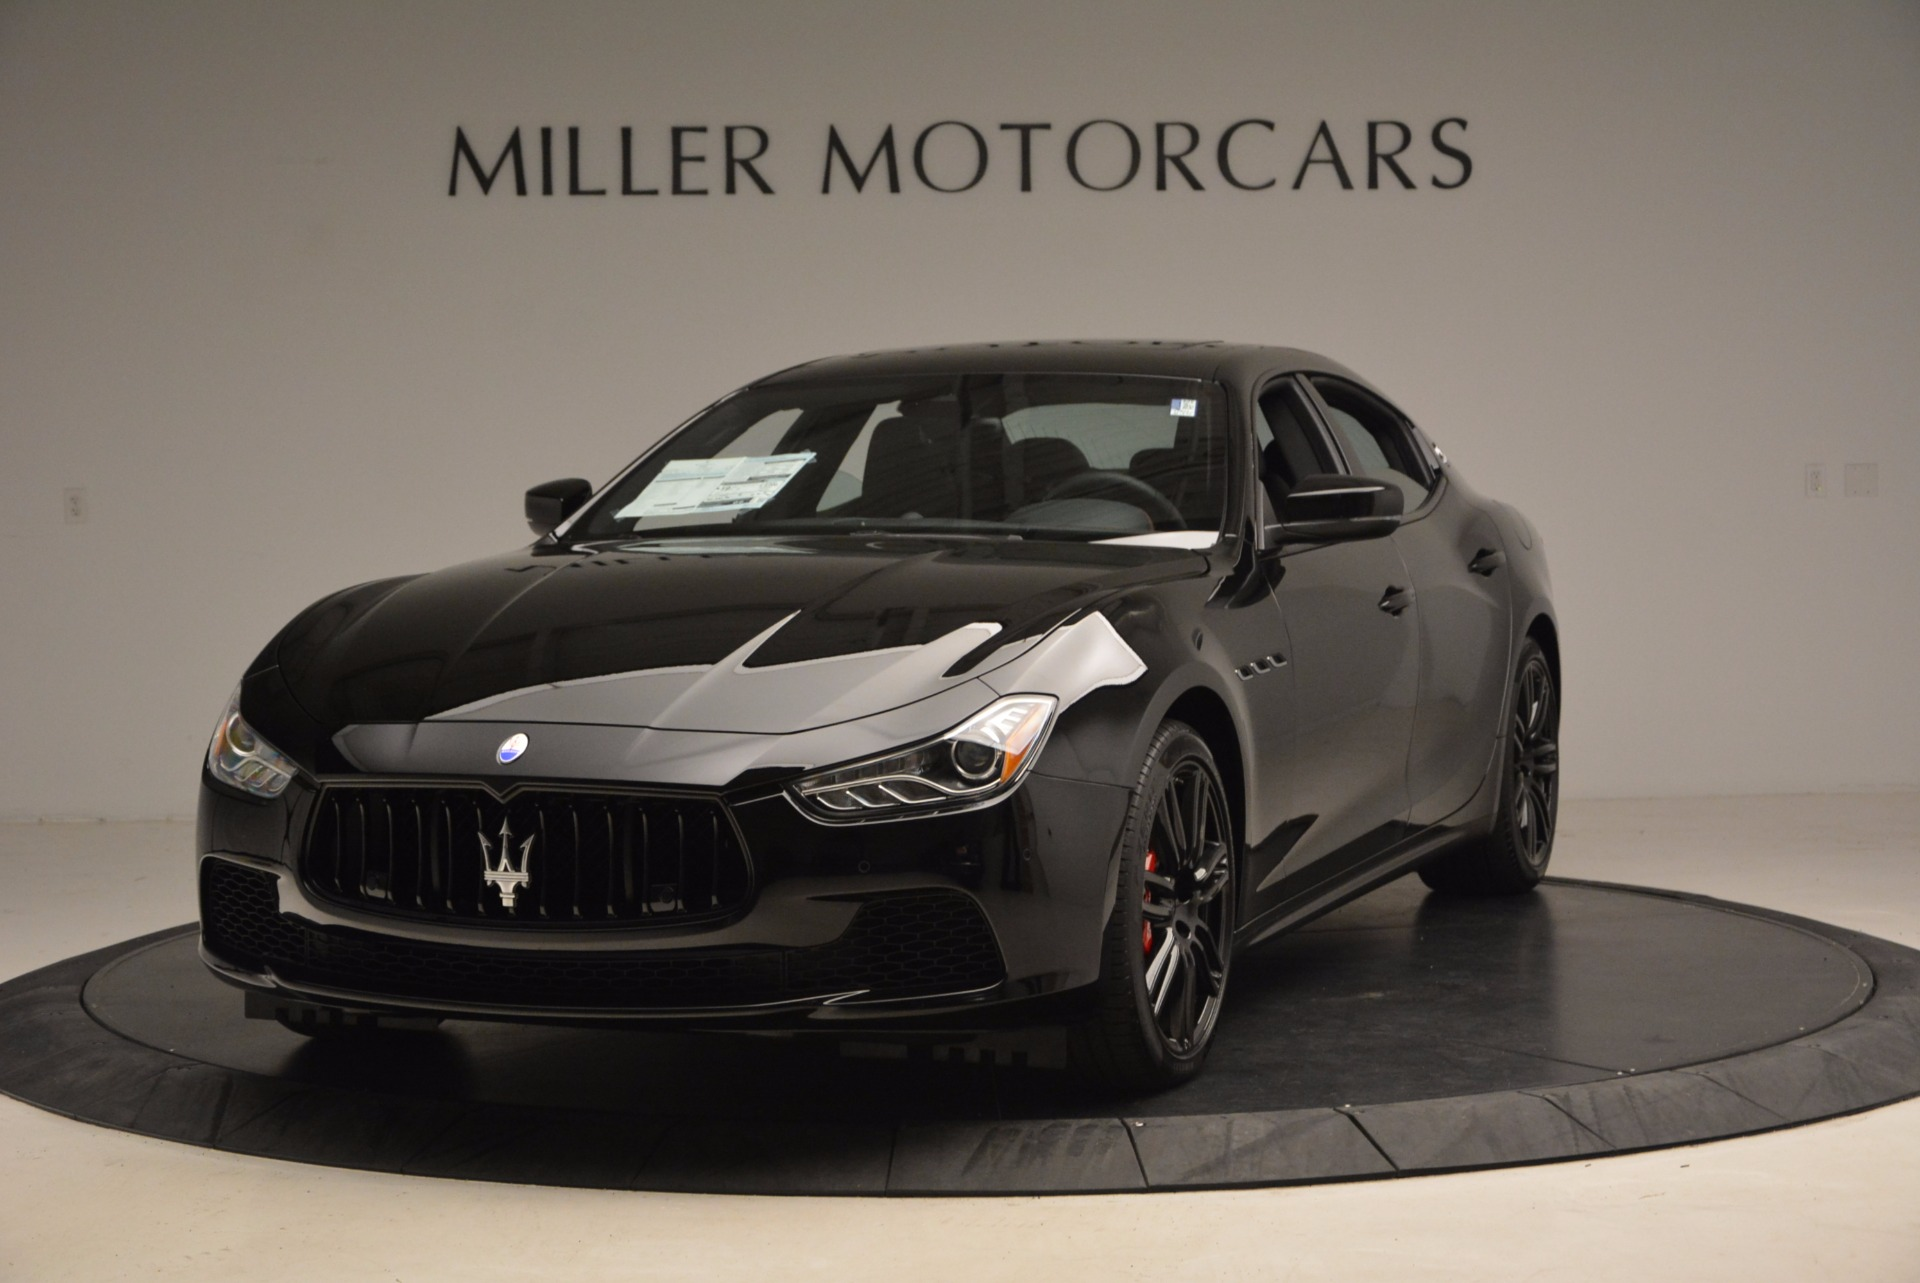 New 2017 Maserati Ghibli S Q4 For Sale In Westport, CT 1461_main